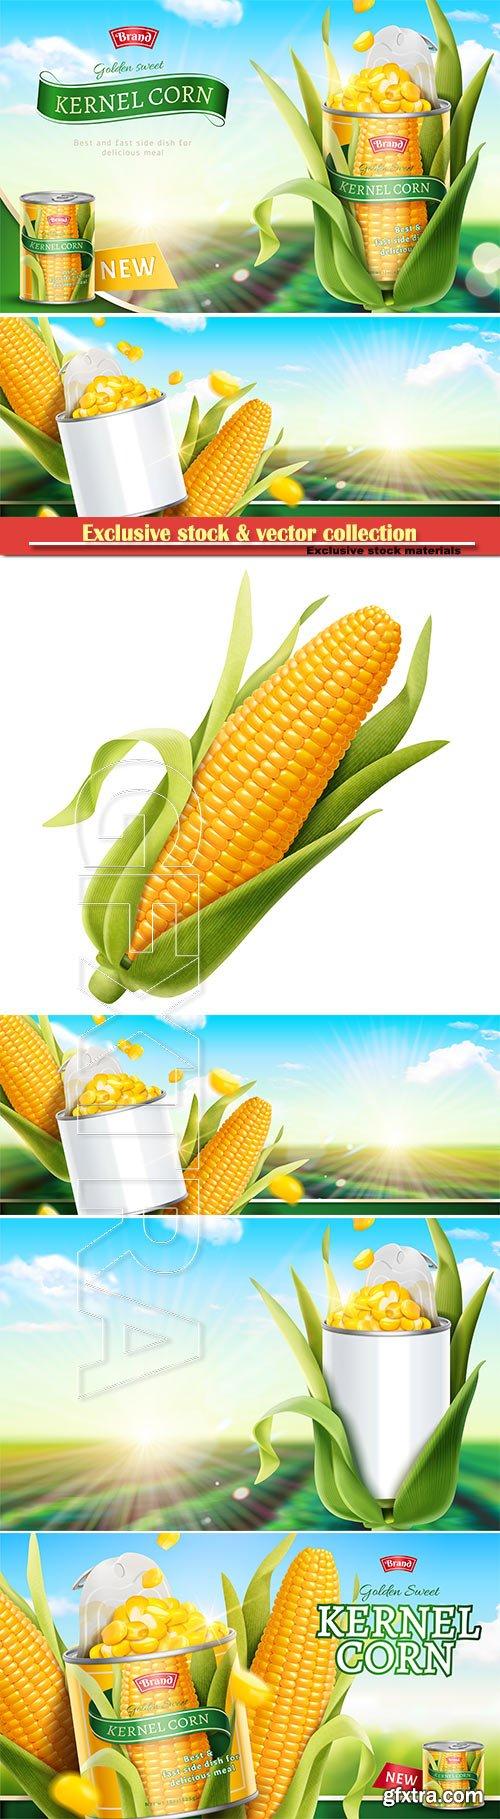 Premium kernel corn can ads in 3d vector illustration